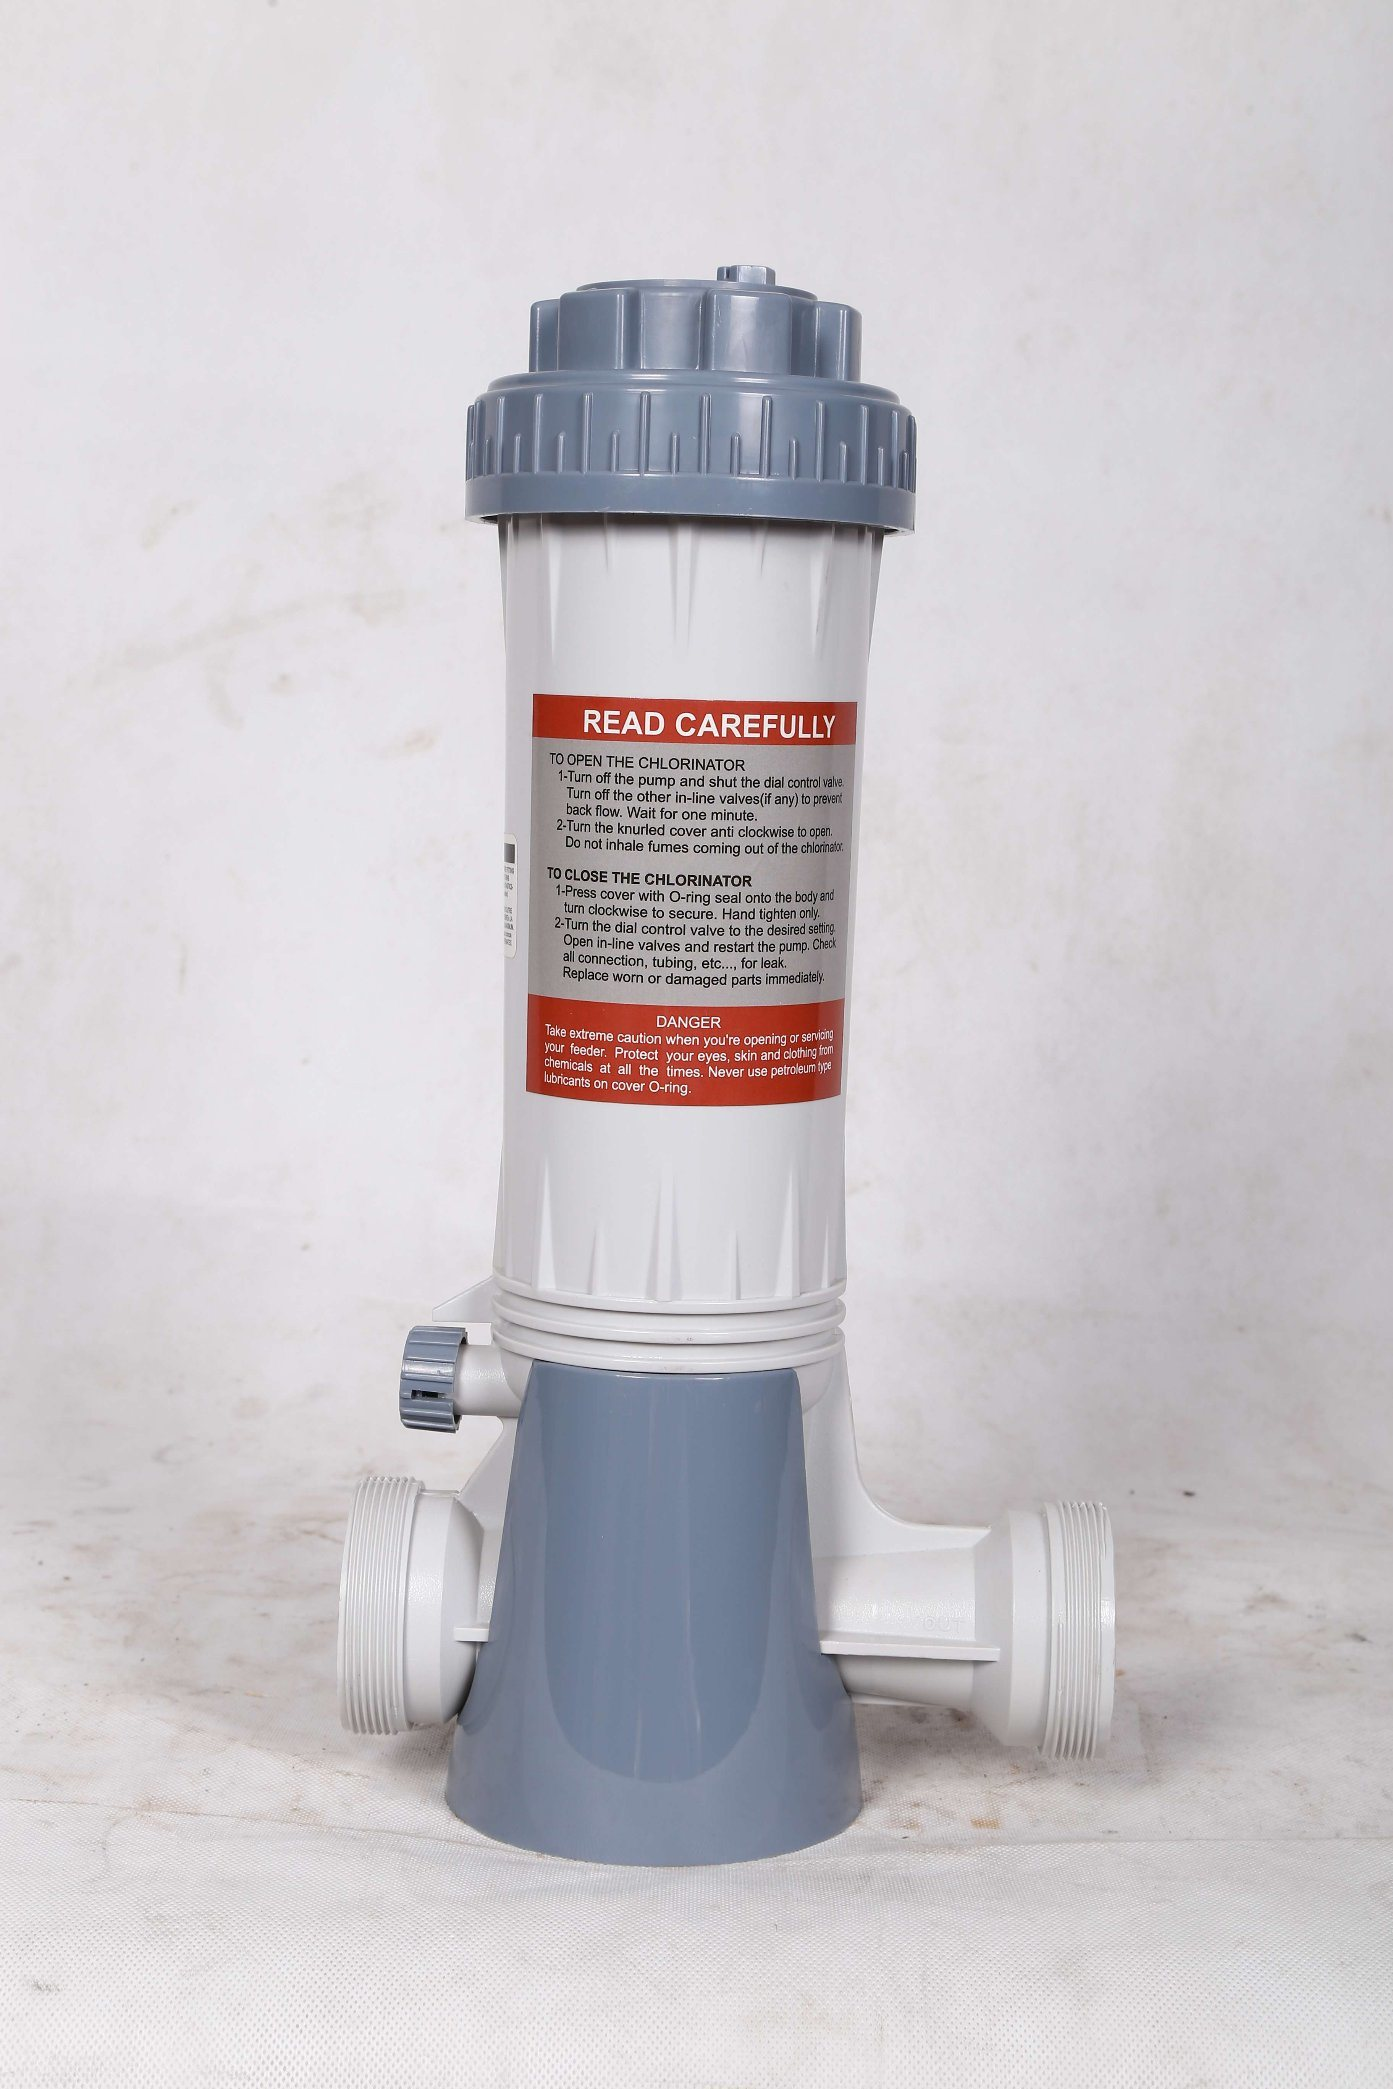 doser automatic psp com swimart virtuemart shop chlorinators product image chlorine auto components feeder tc poppits dos